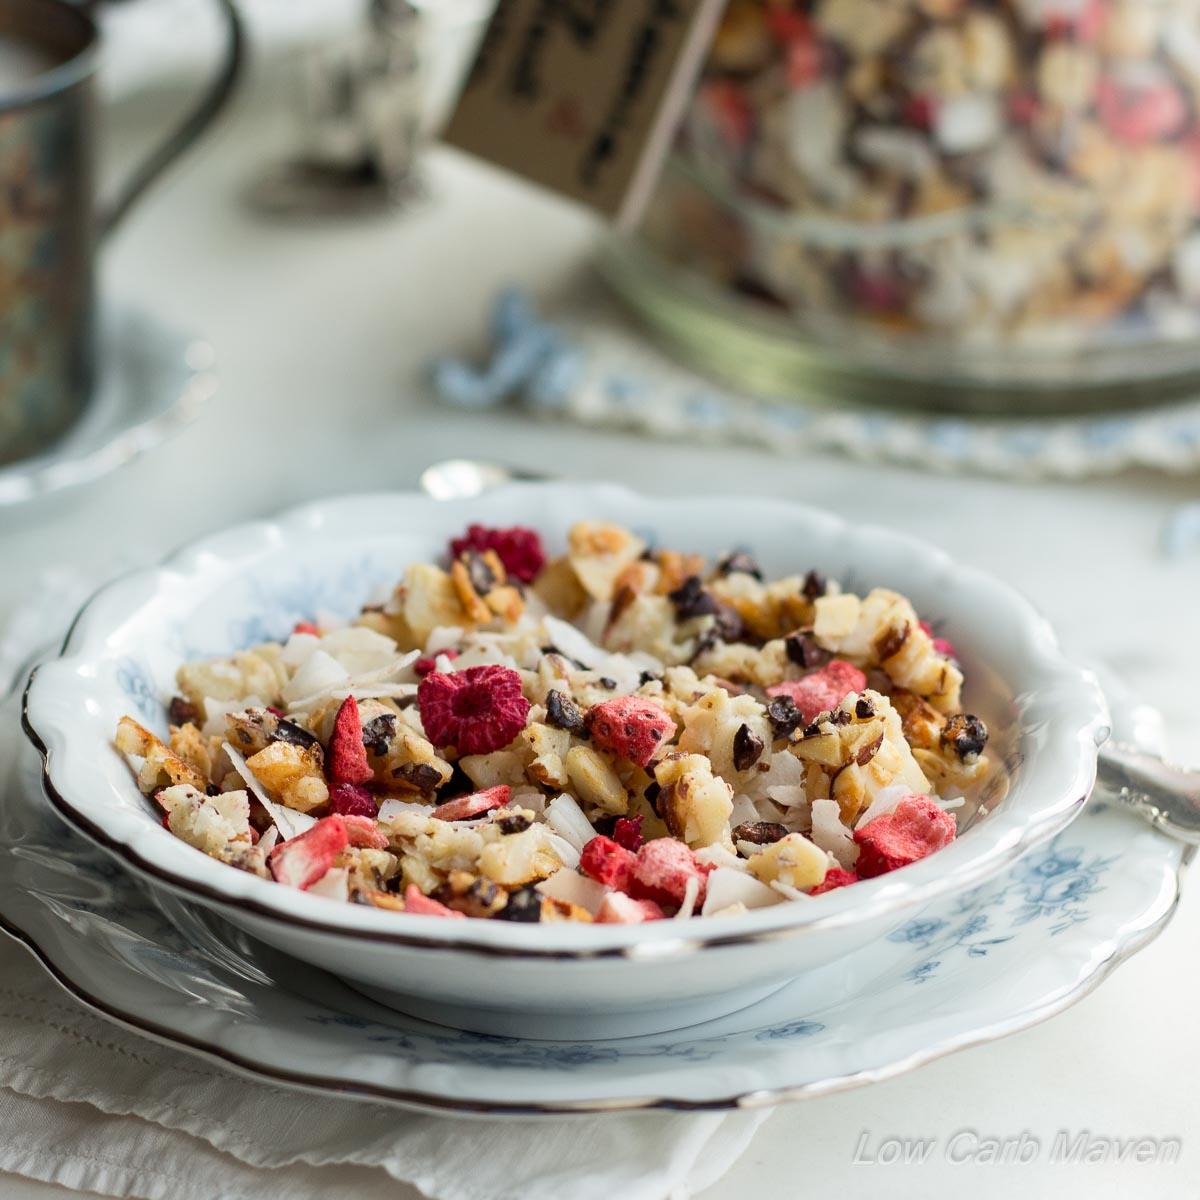 macadamia-berry-blast-granola-3